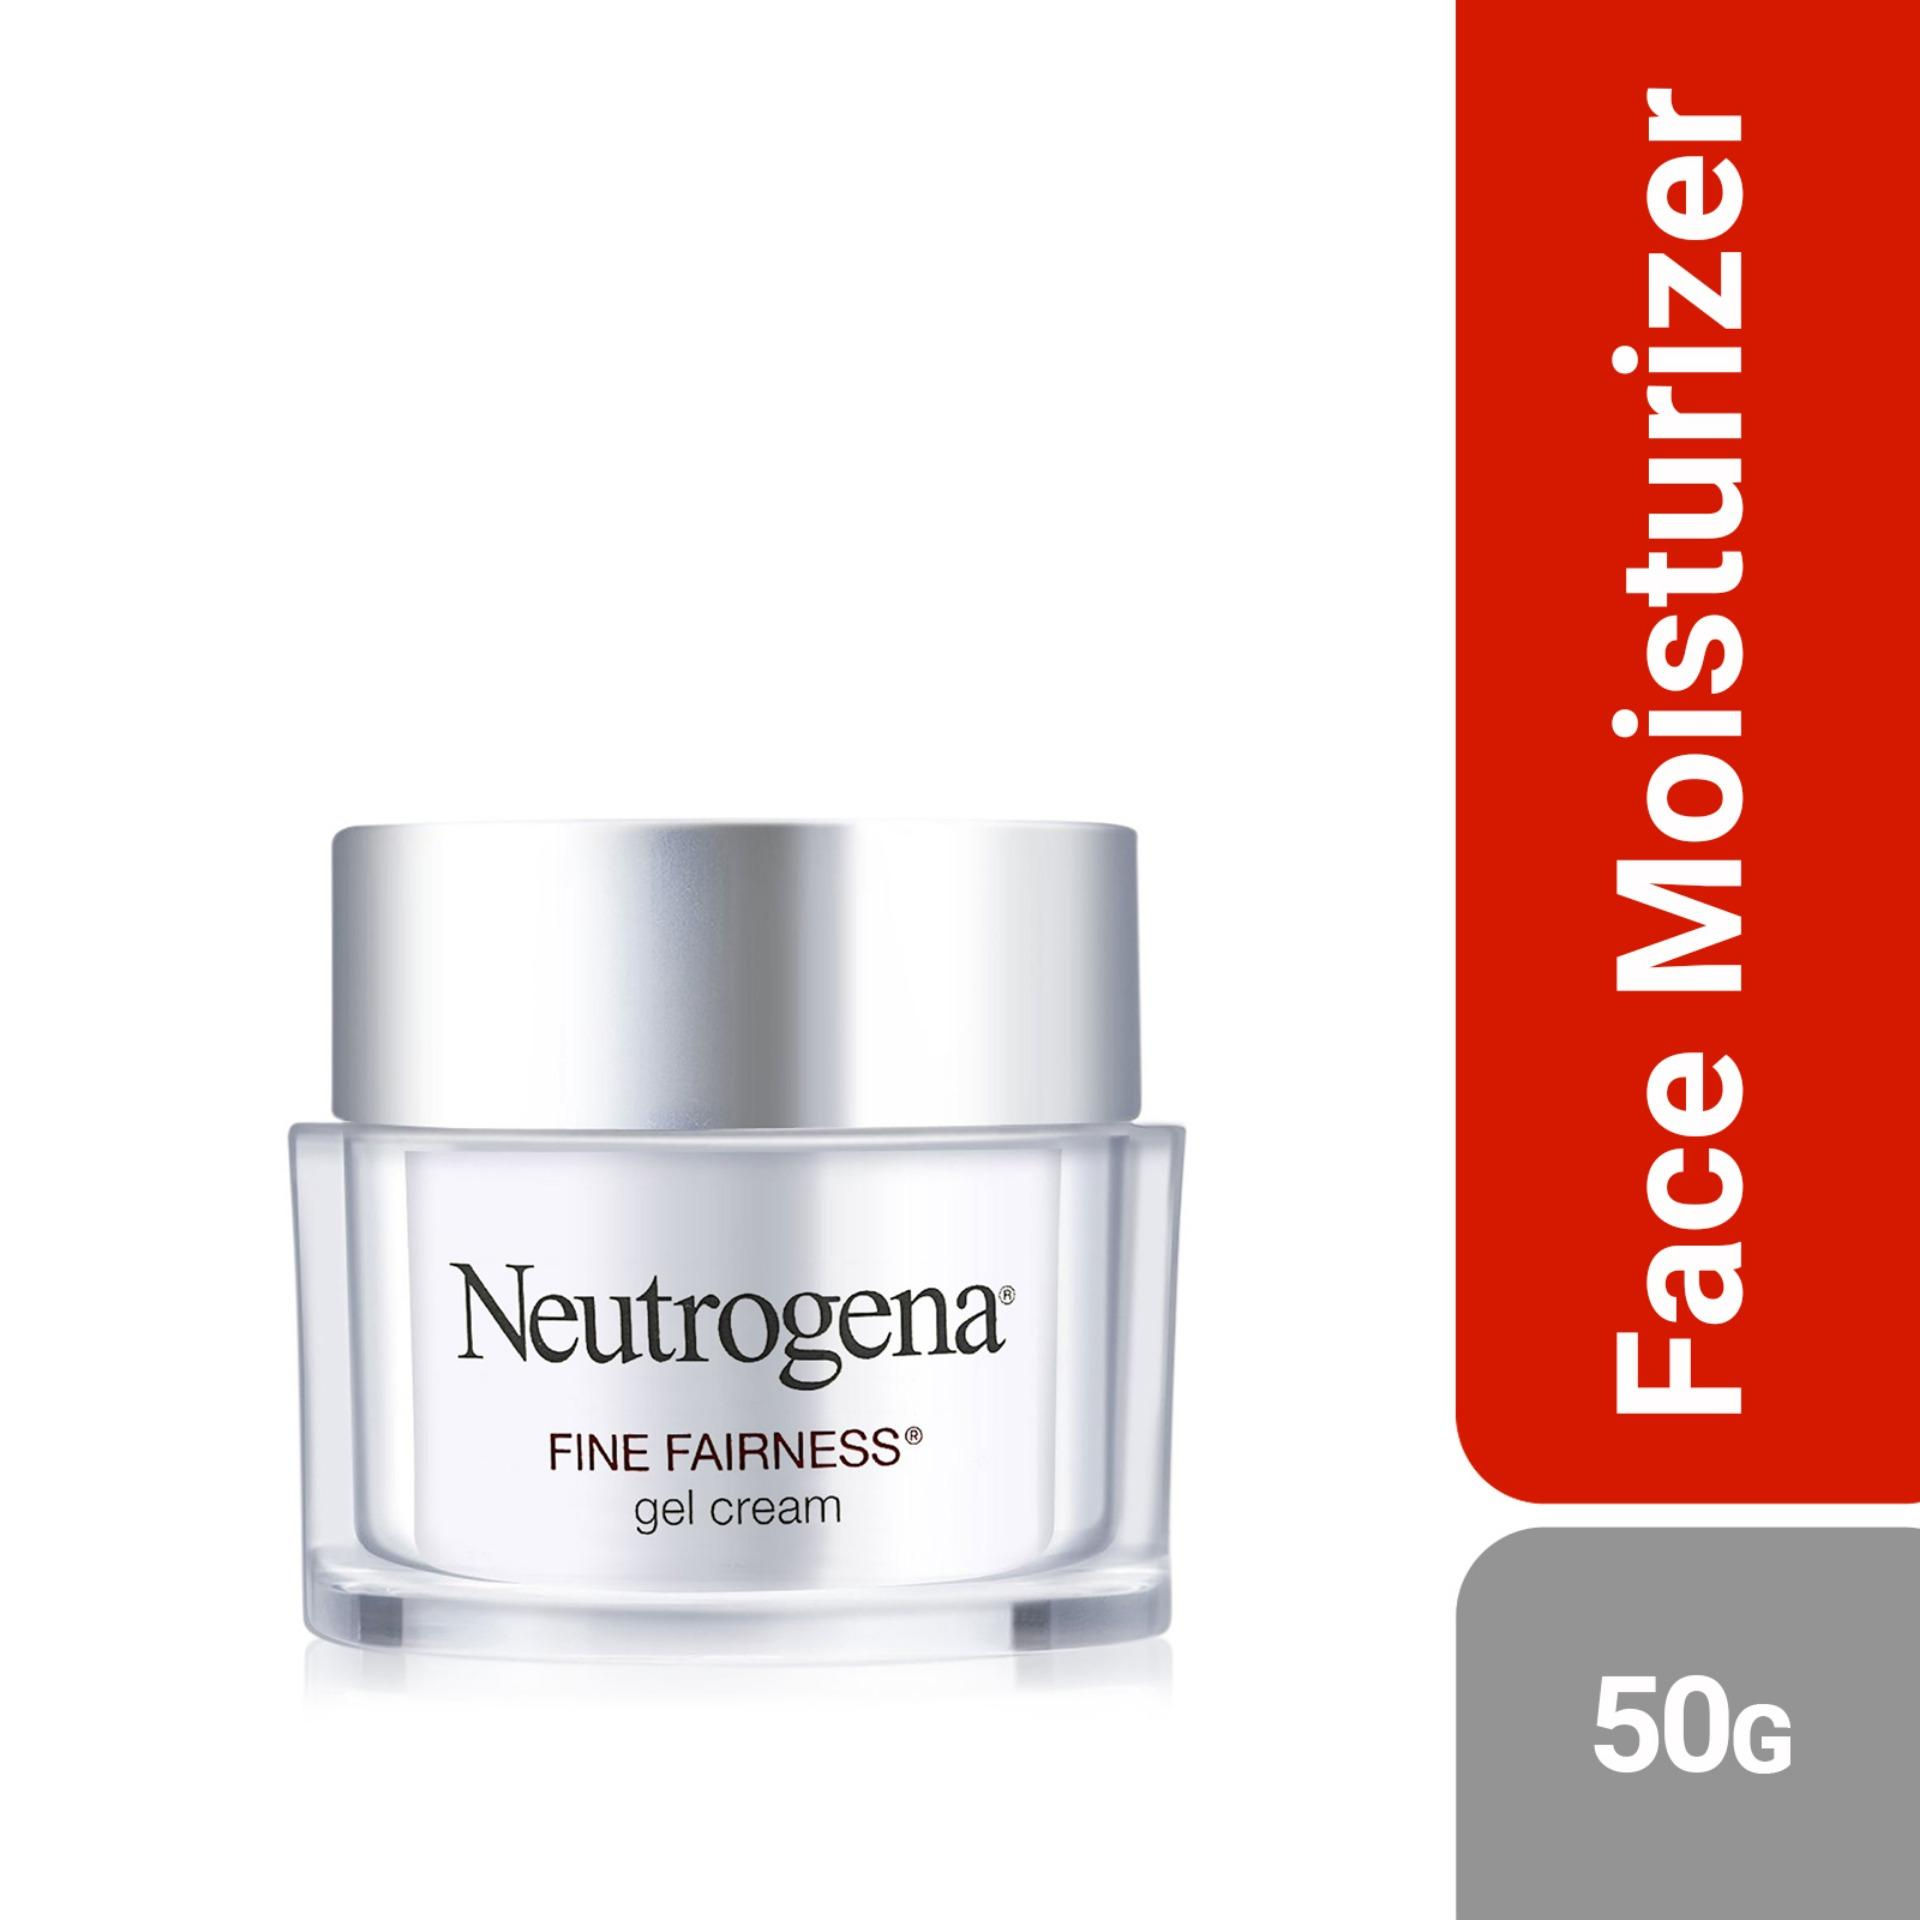 Johnson And Official Store Buy Baby Cream 50g Neutrogena Fine Fairness Gel